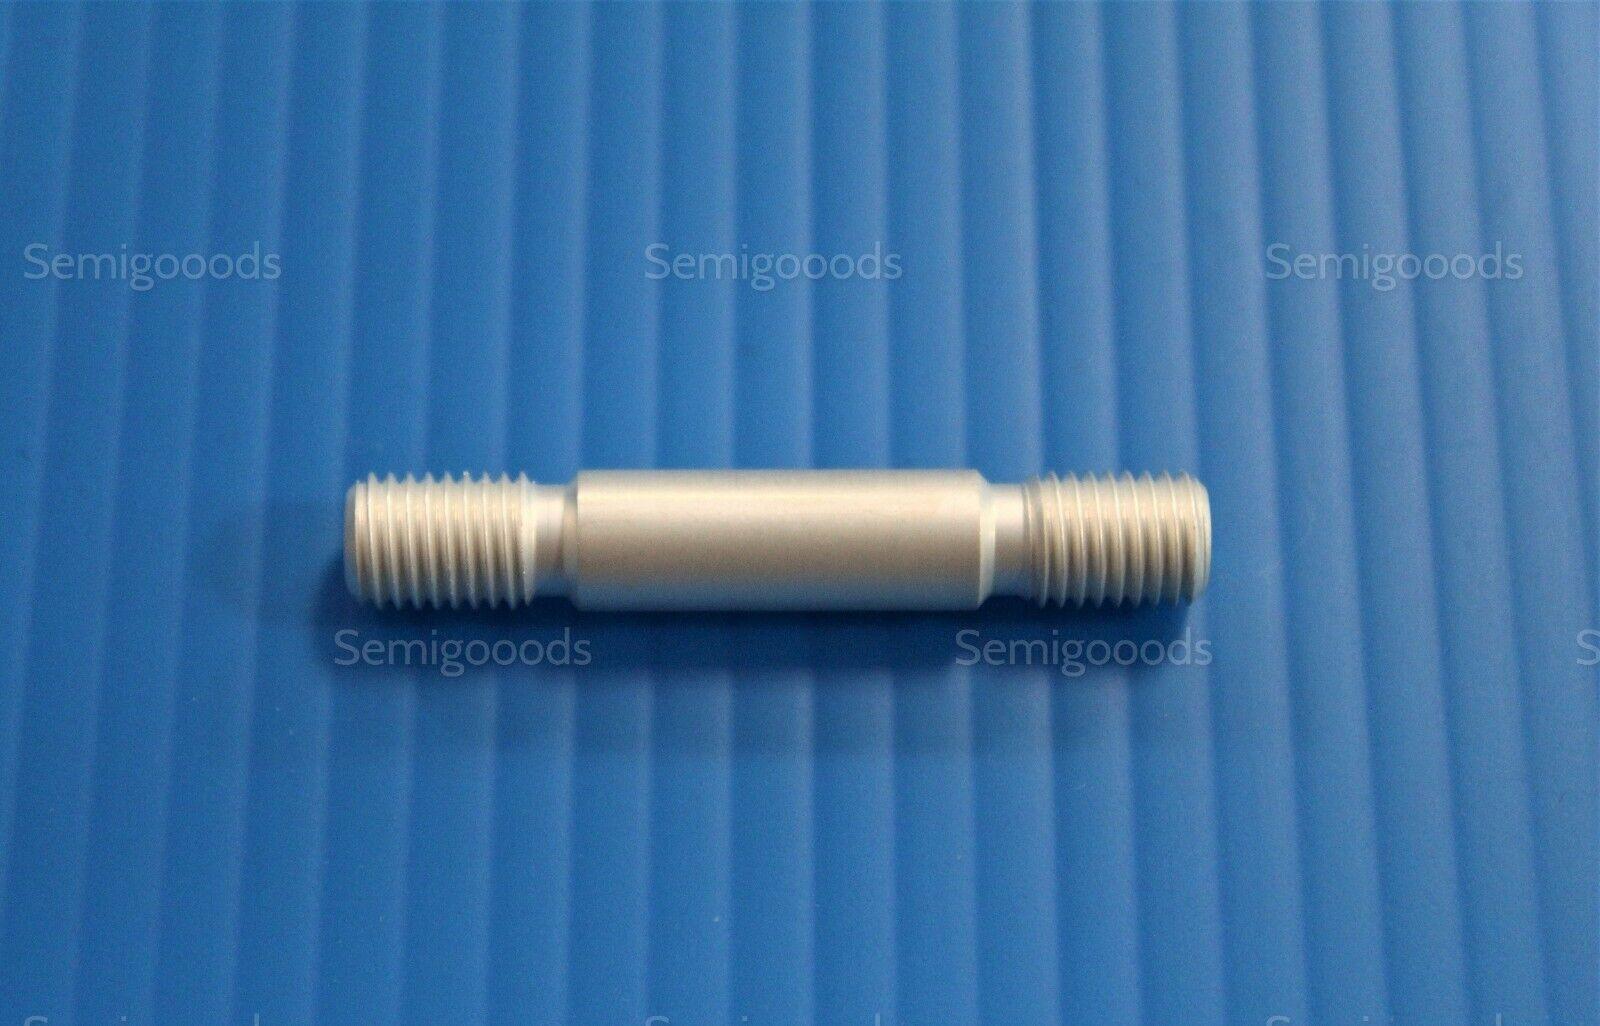 324-0102//// AMAT APPLIED 3090-01102 BOLT  12PT HD 1//4-28 X 1-1//4L  2ND SOURCE NEW